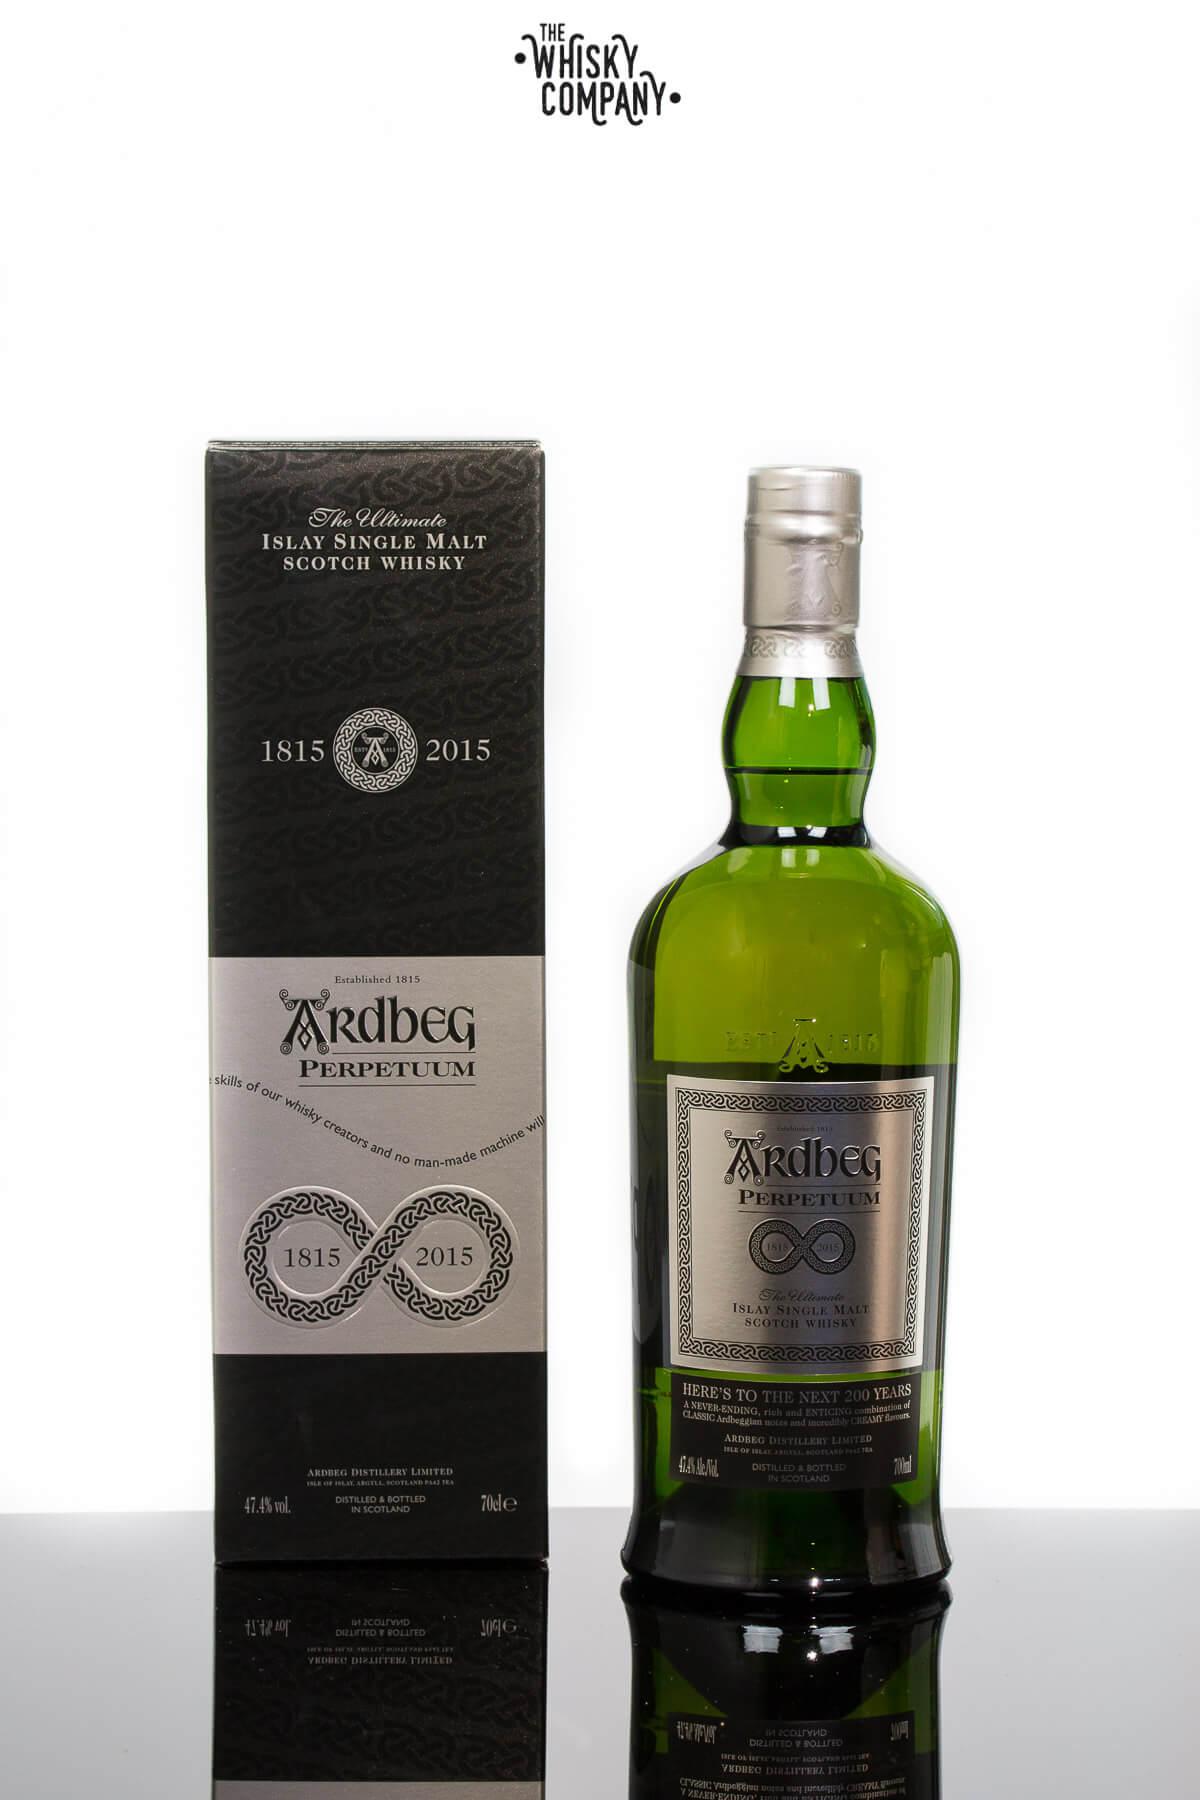 the islay whisky company ltd Buy laphroaig aged 18 years limited release islay single malt scotch whisky from the whisky company shop online for rare, limited edition, vintage and aged scottish single malt whiskey.